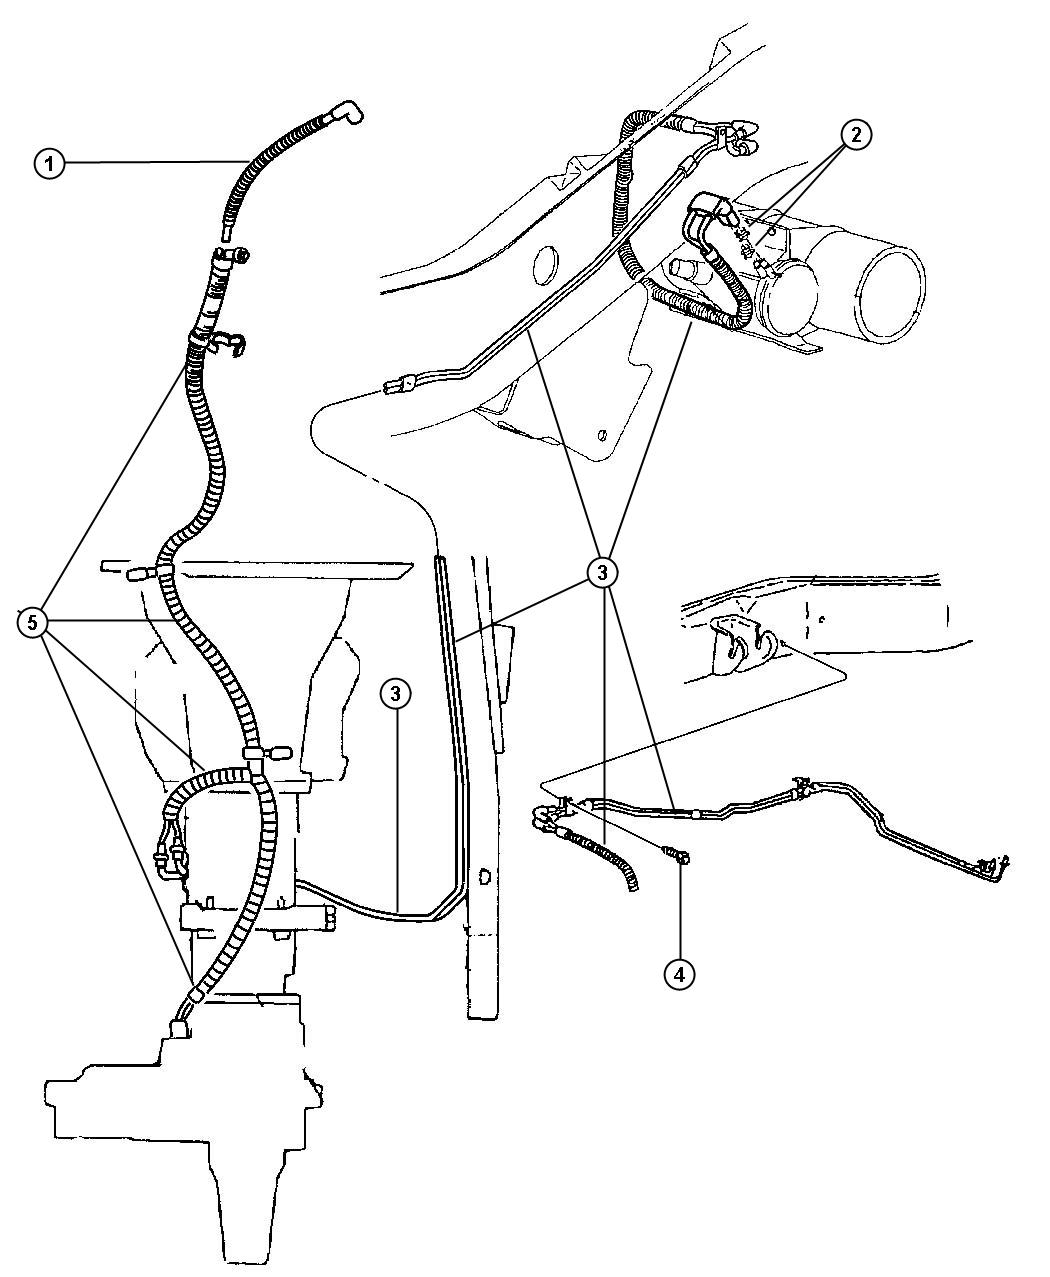 Dodge Ram 5 9l V8 Smpi 4 Spd Automatic 46re Vacuum